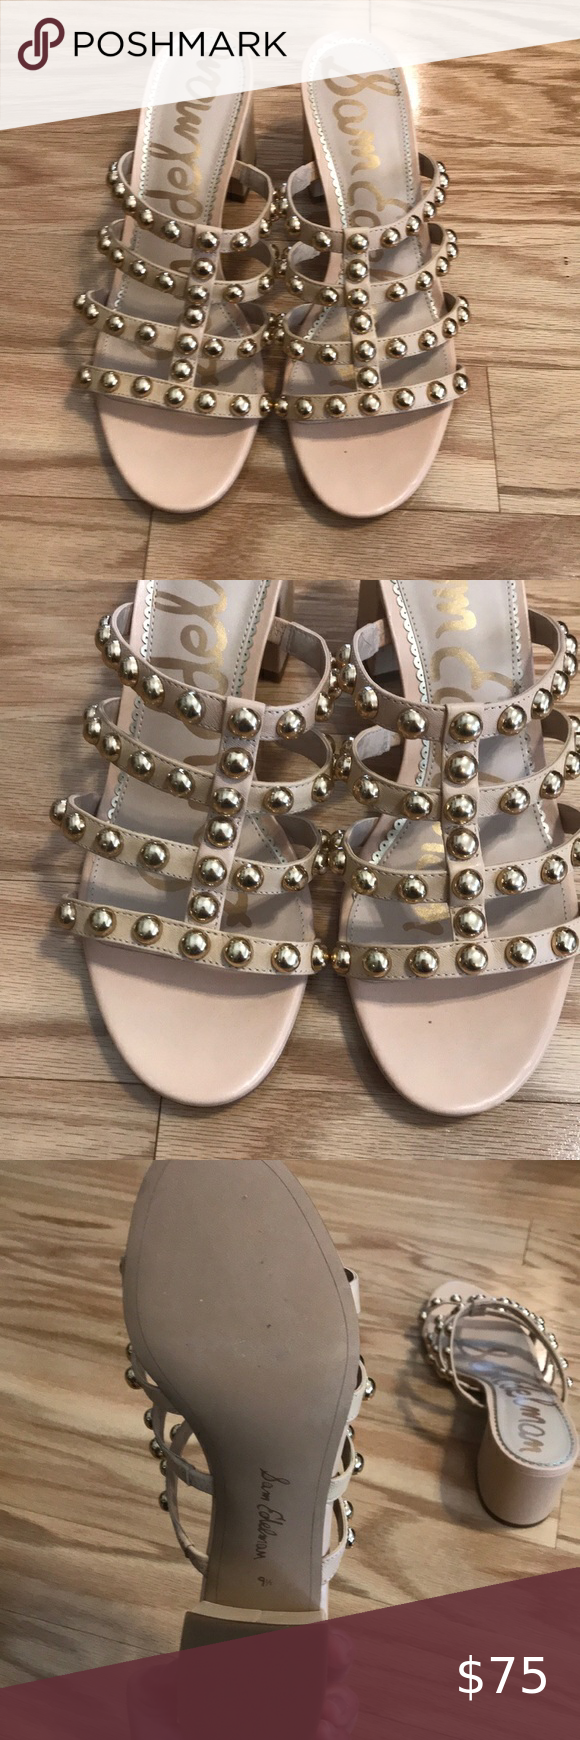 Sam Edelman Suri Block Heeled Sandals Sam Edelman Suri Block Heeled Sandals Size 9 5 Sam Edelman Shoes Sandals In 2020 Block Heels Sandal Sandals Heels Block Heels